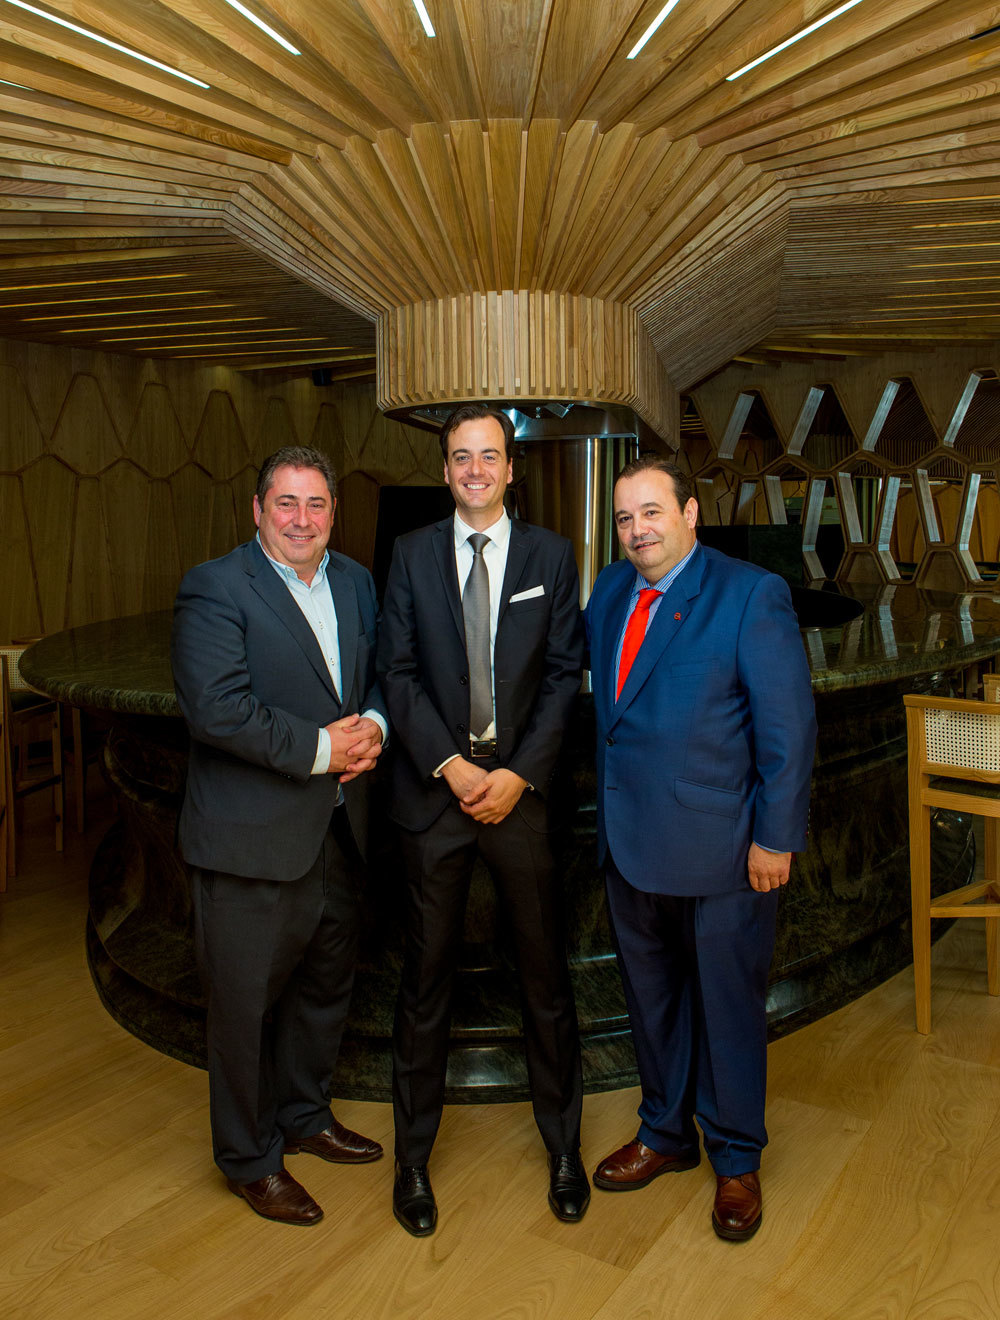 Cayo Martínez, Jorge Dávila y José Gómez.